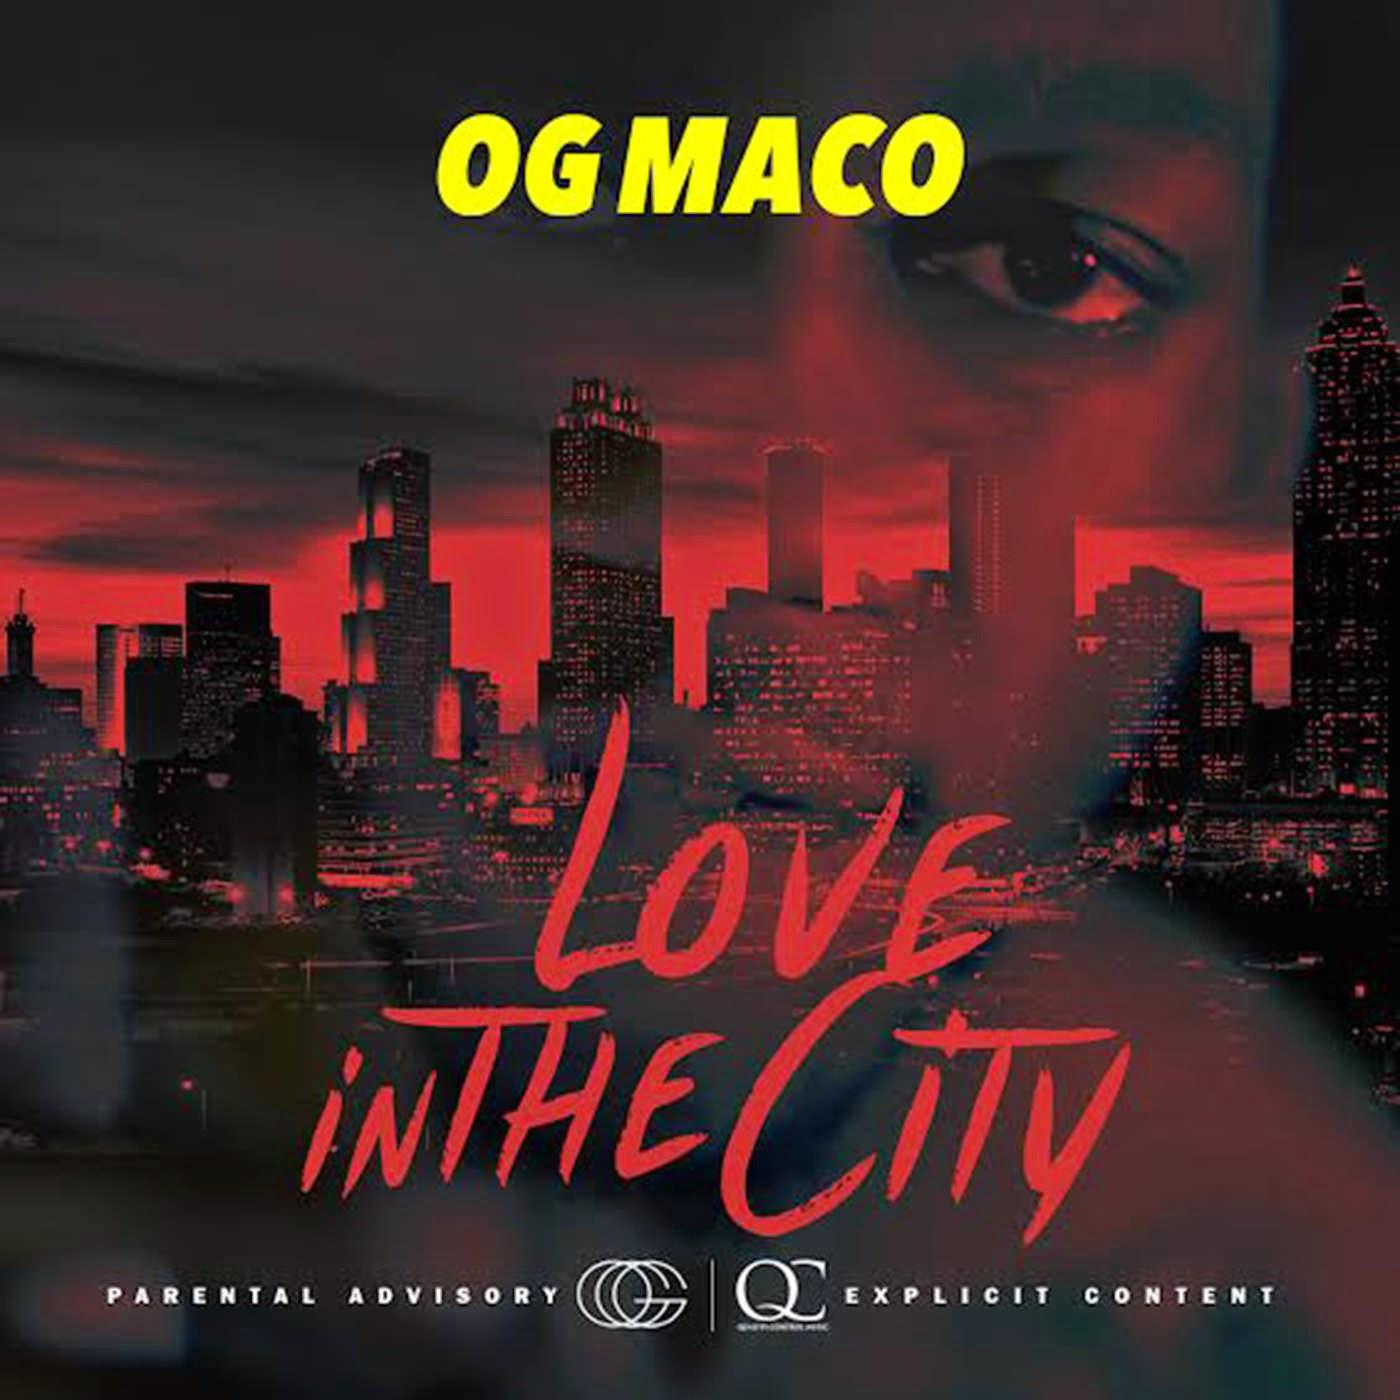 Og Maco - Love In the City - Single Cover